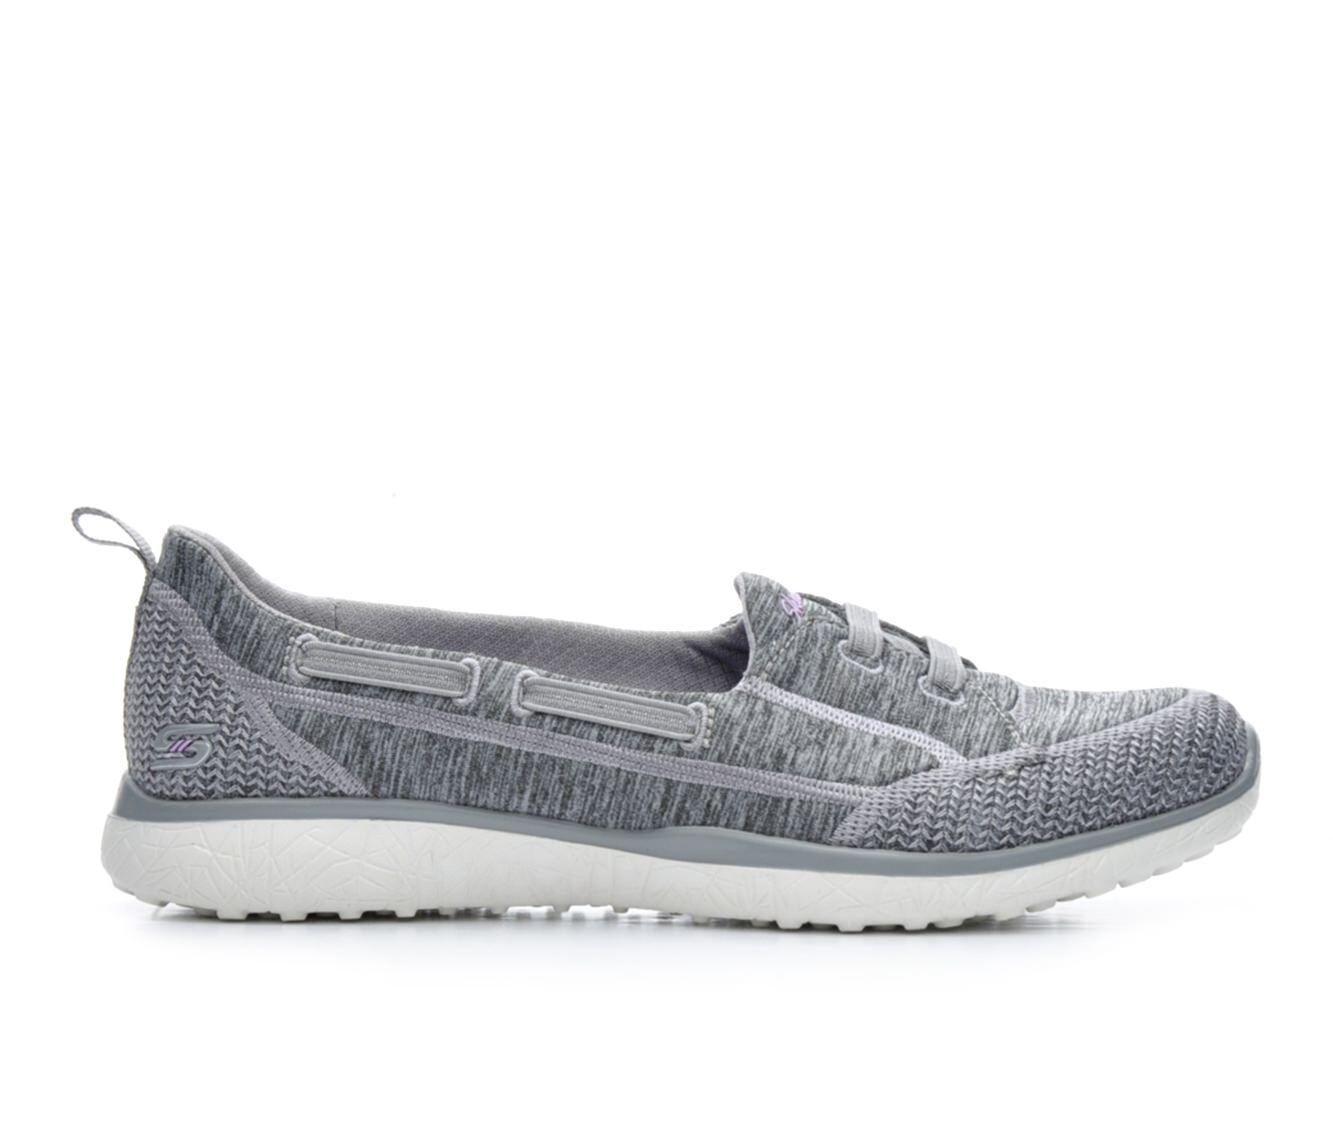 Skechers Womens Shoes Grey (Size: 7 1/2)